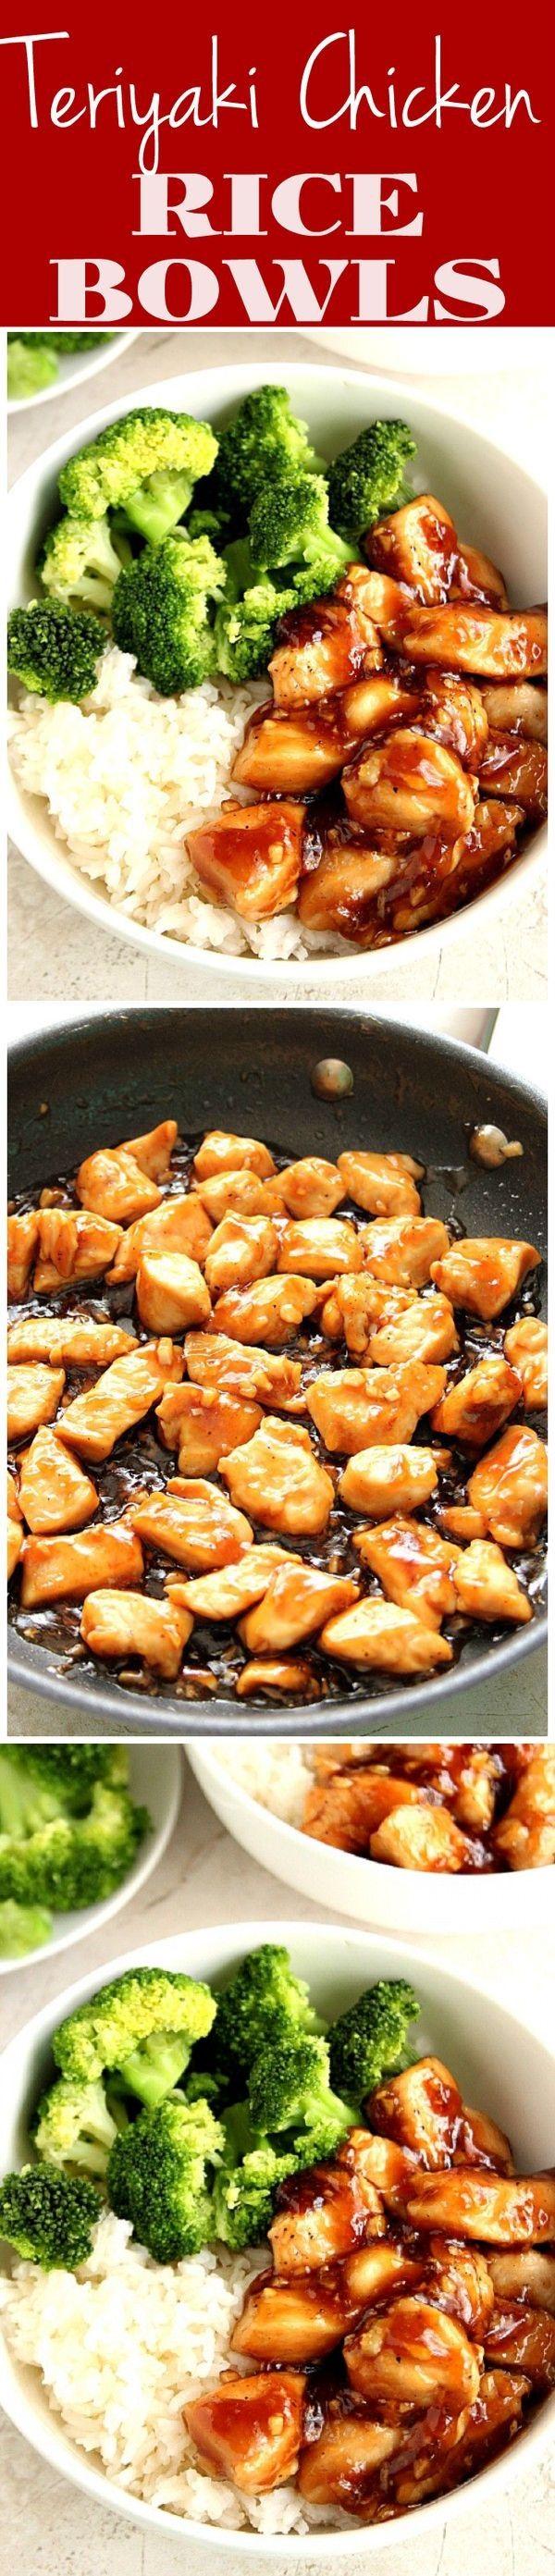 Quick Teriyaki Chicken Rice Bowls